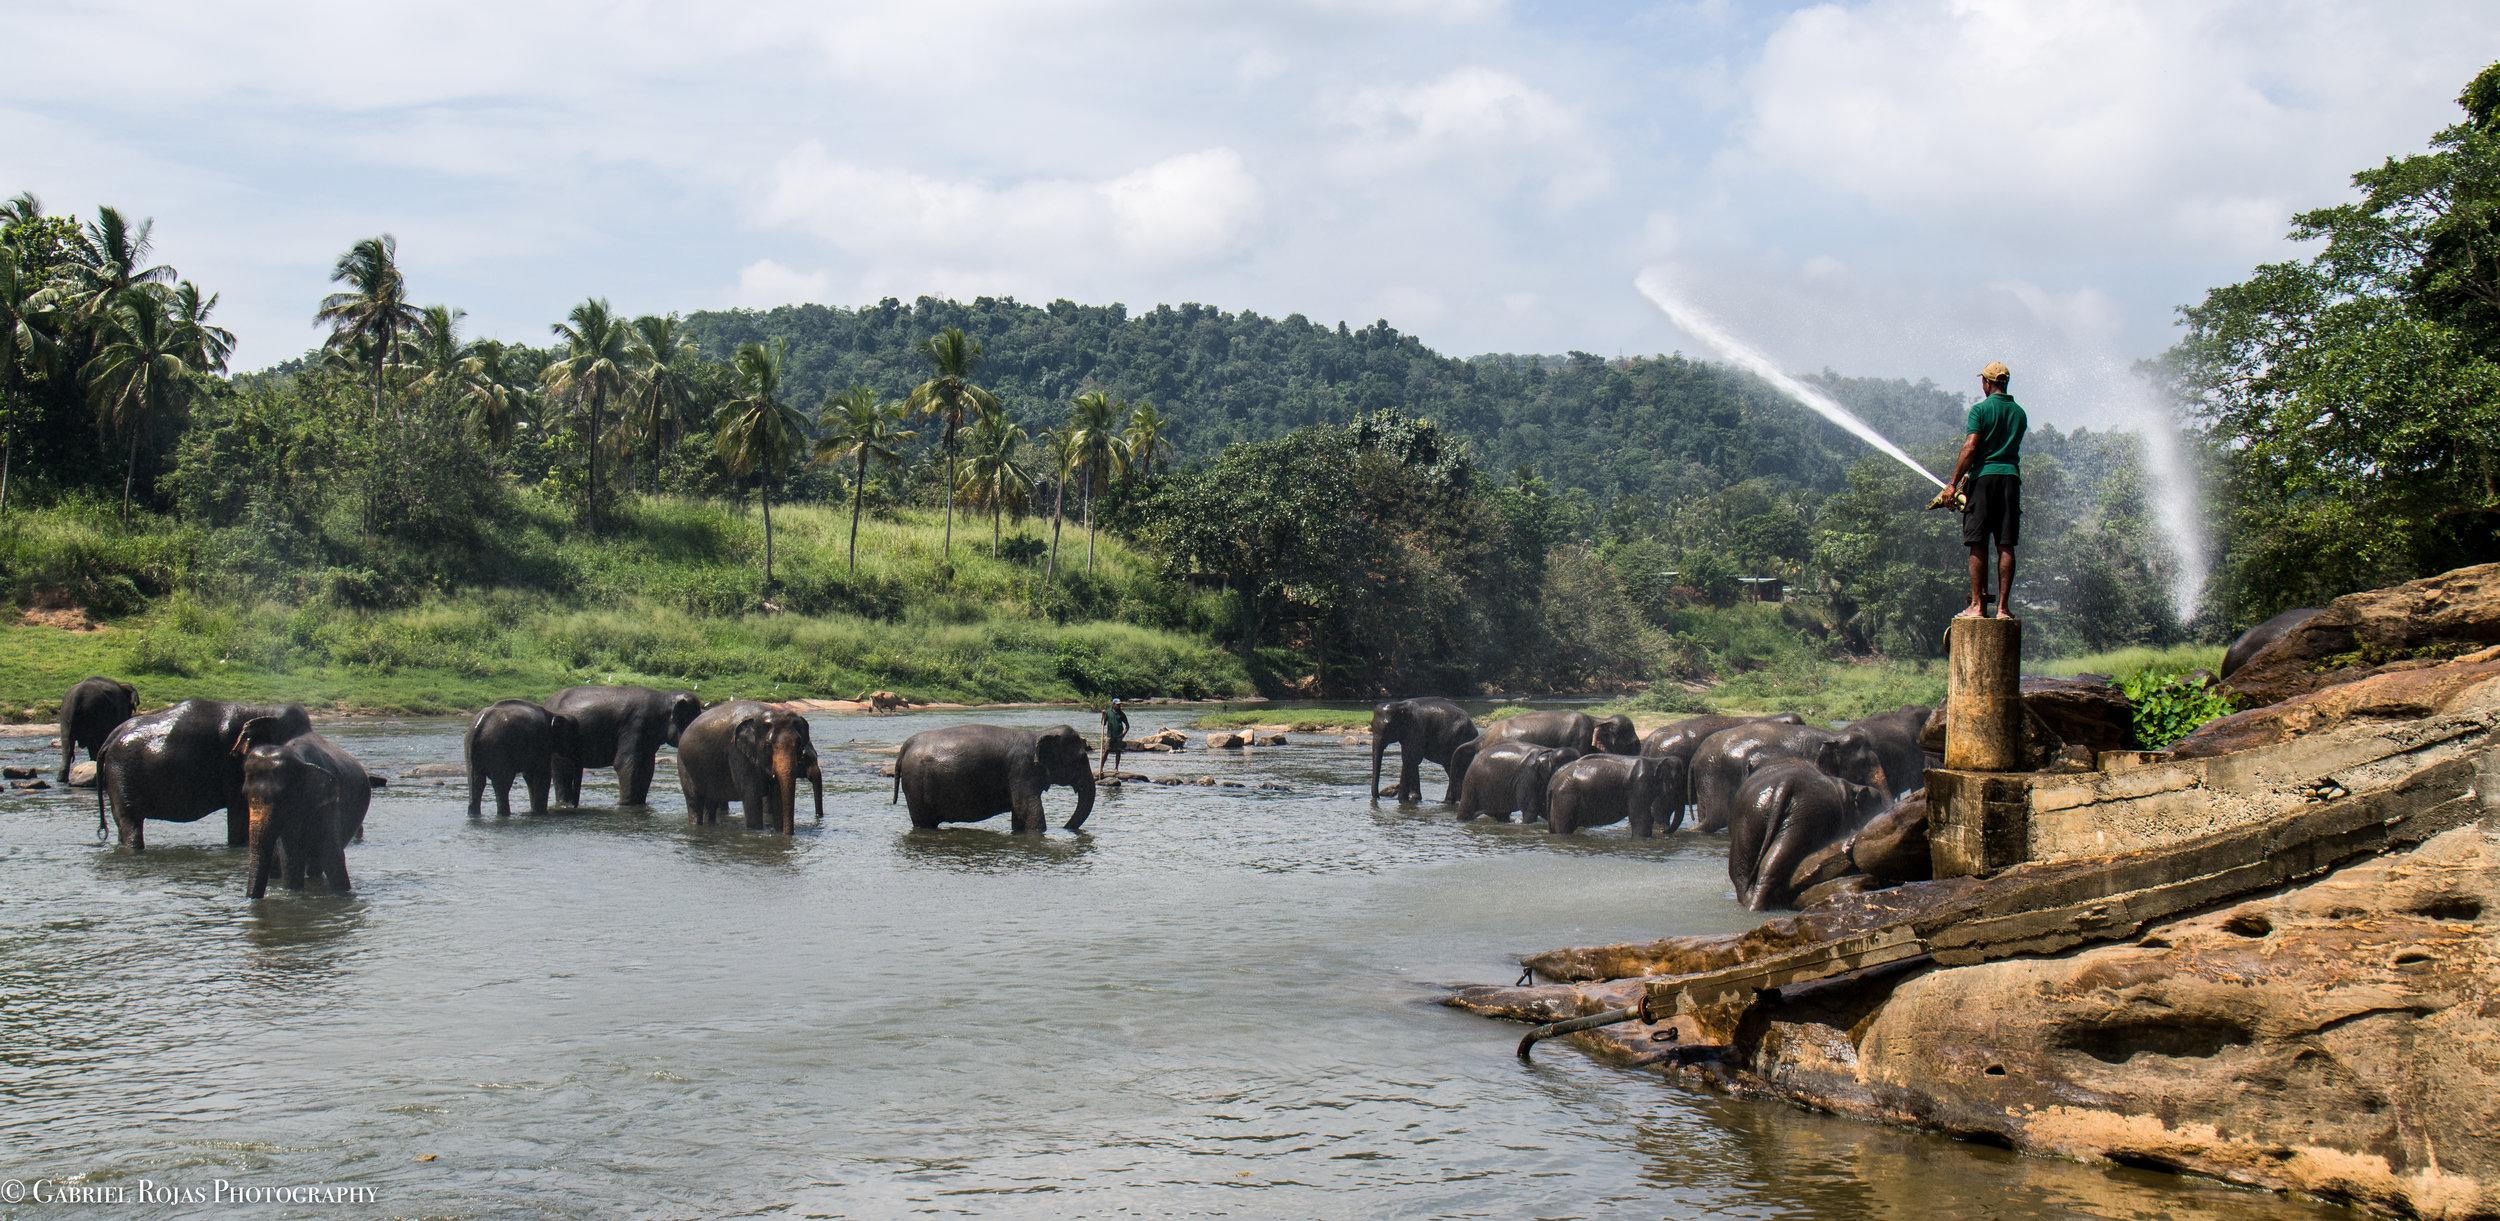 Sri Lanka 2019-6.jpg